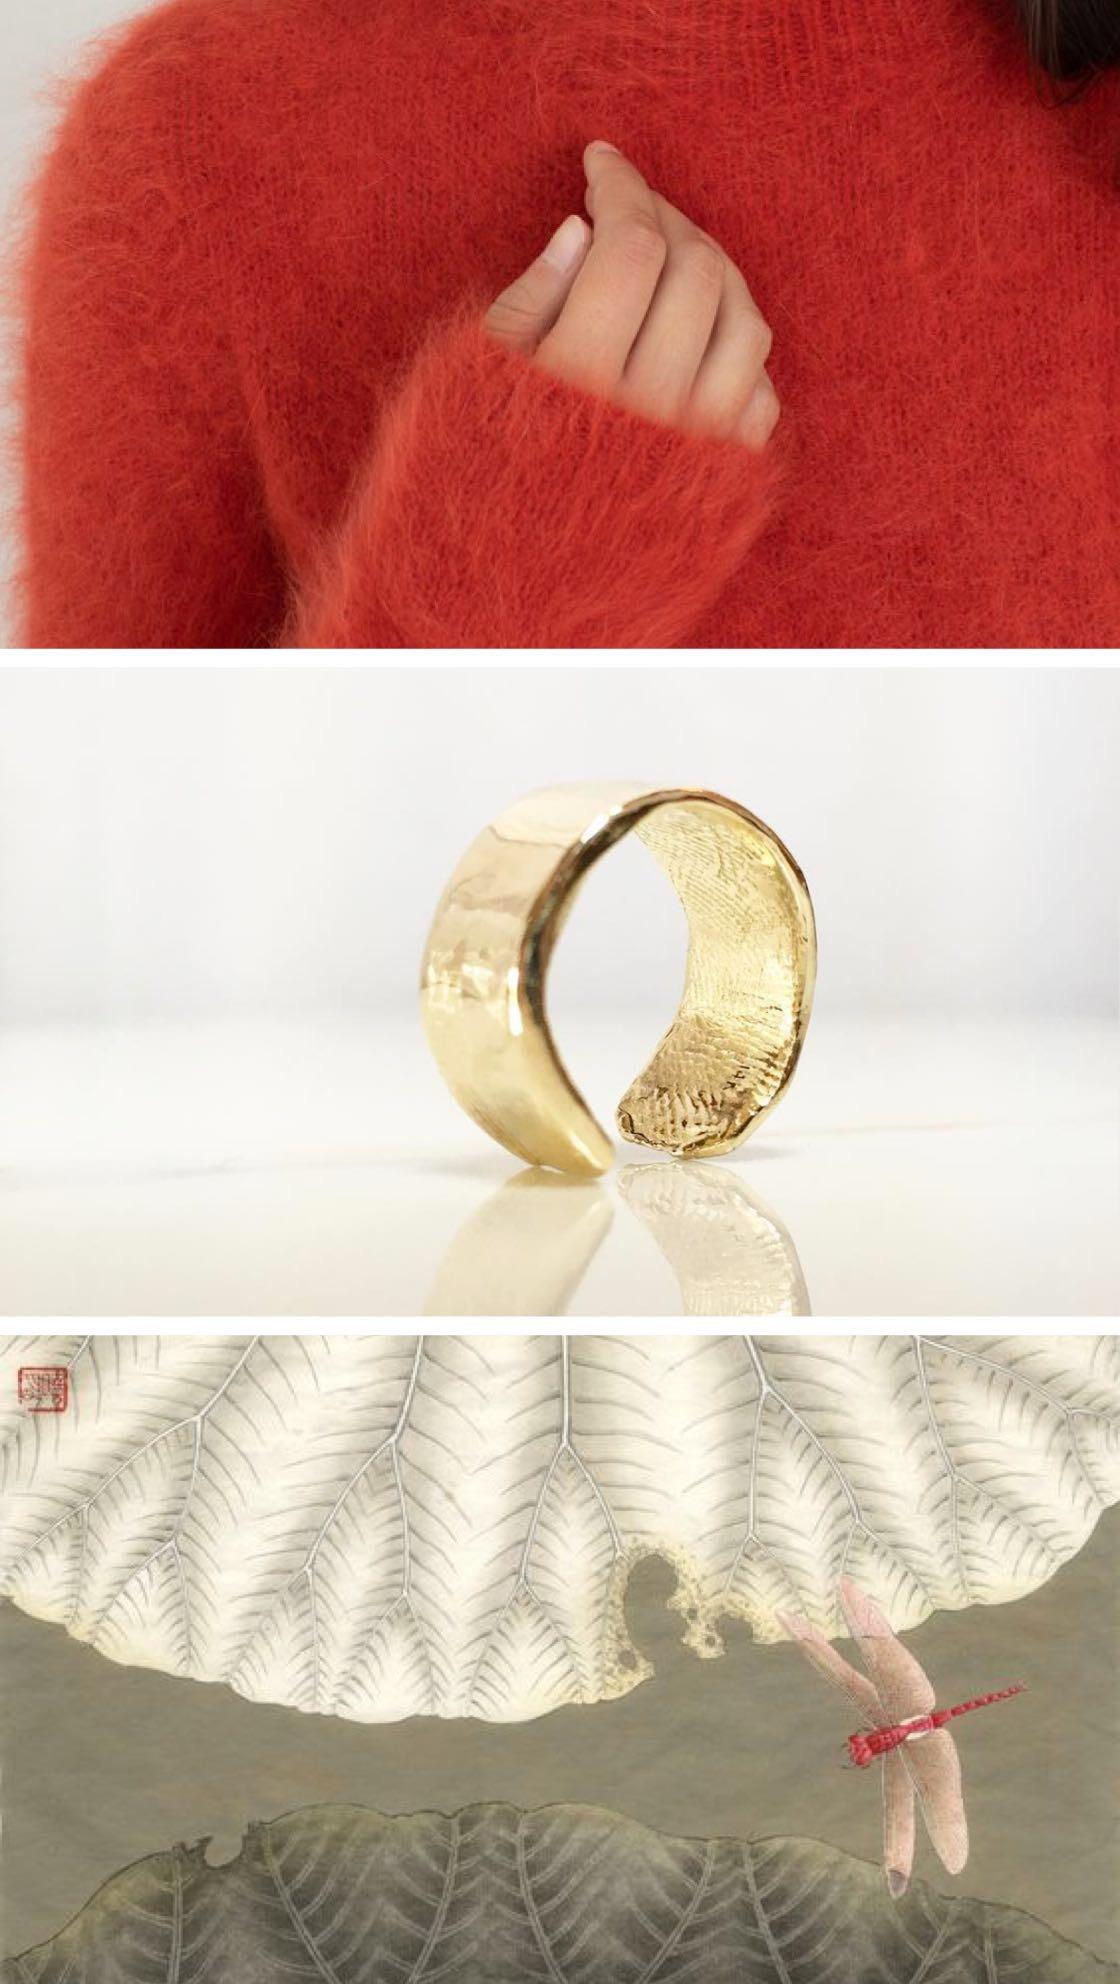 *Ulla Johnson, Mars turtleneck in crimson  |   Cicca Ring, S, 14K   |  Chinese painting.